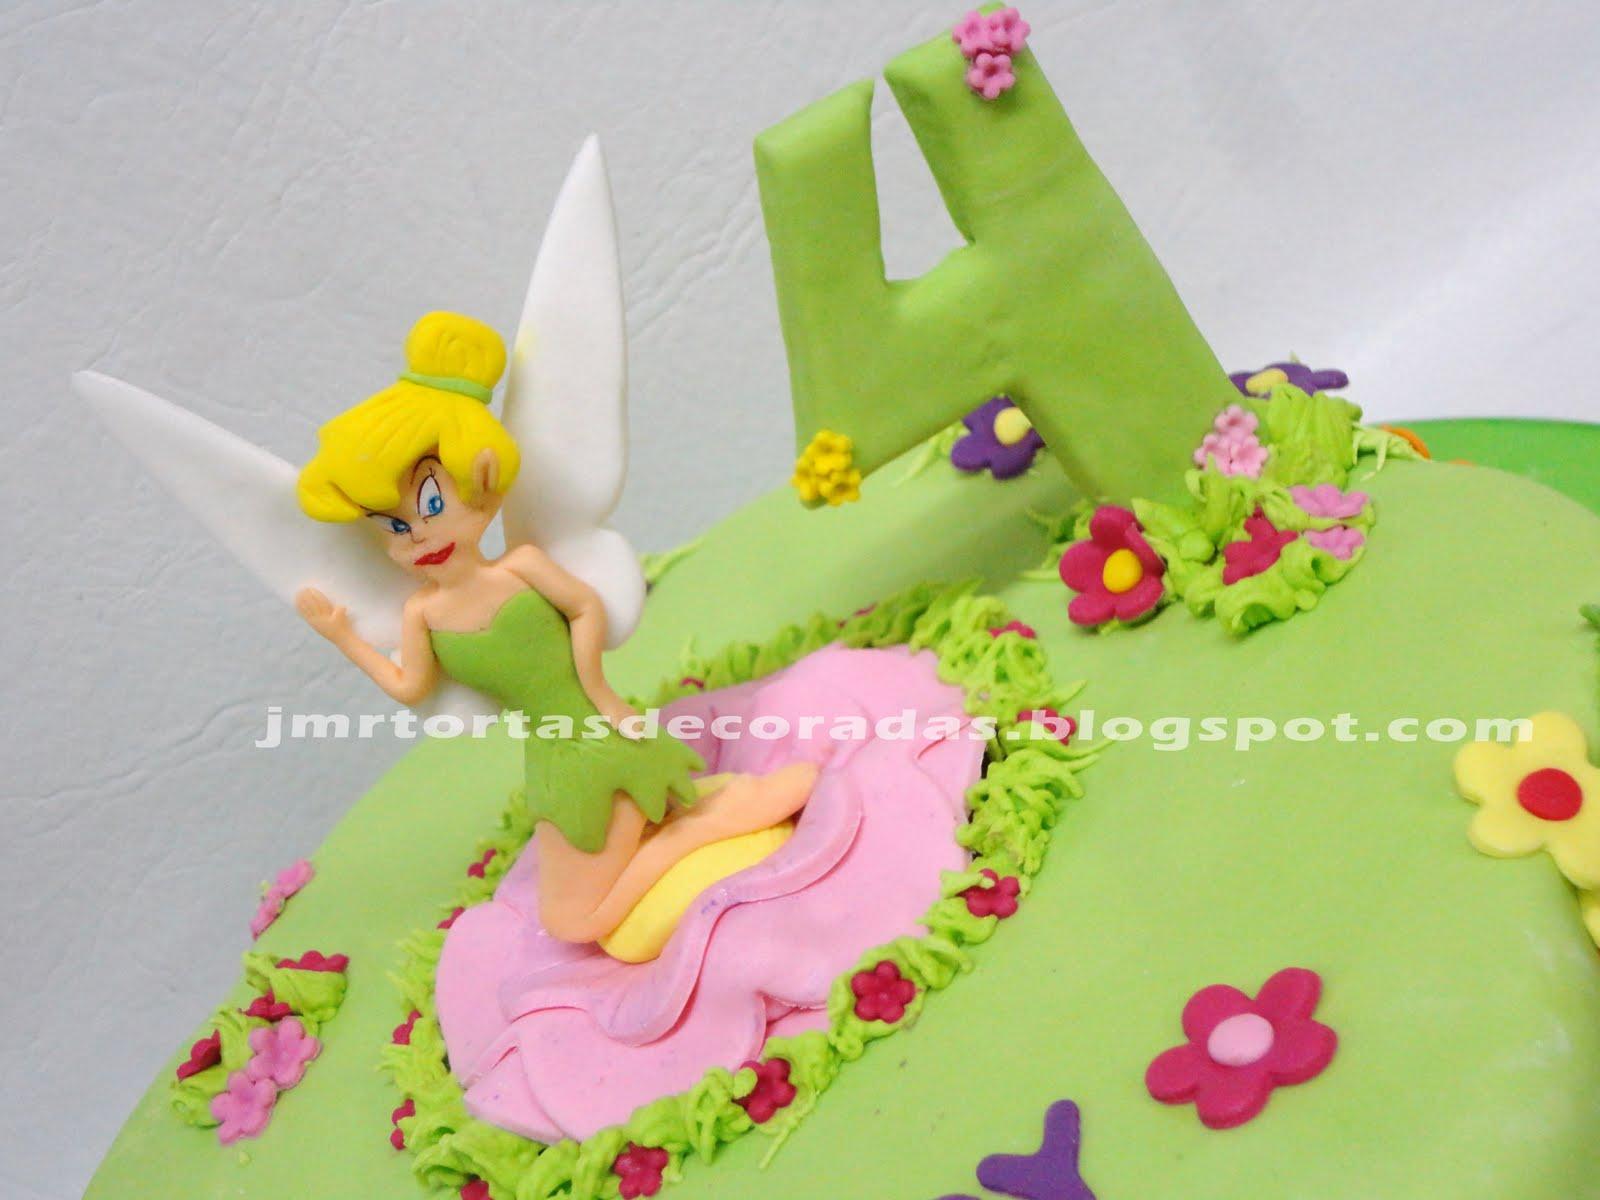 Torta Campanita Tinkerbell | JMR Tortas Decoradas